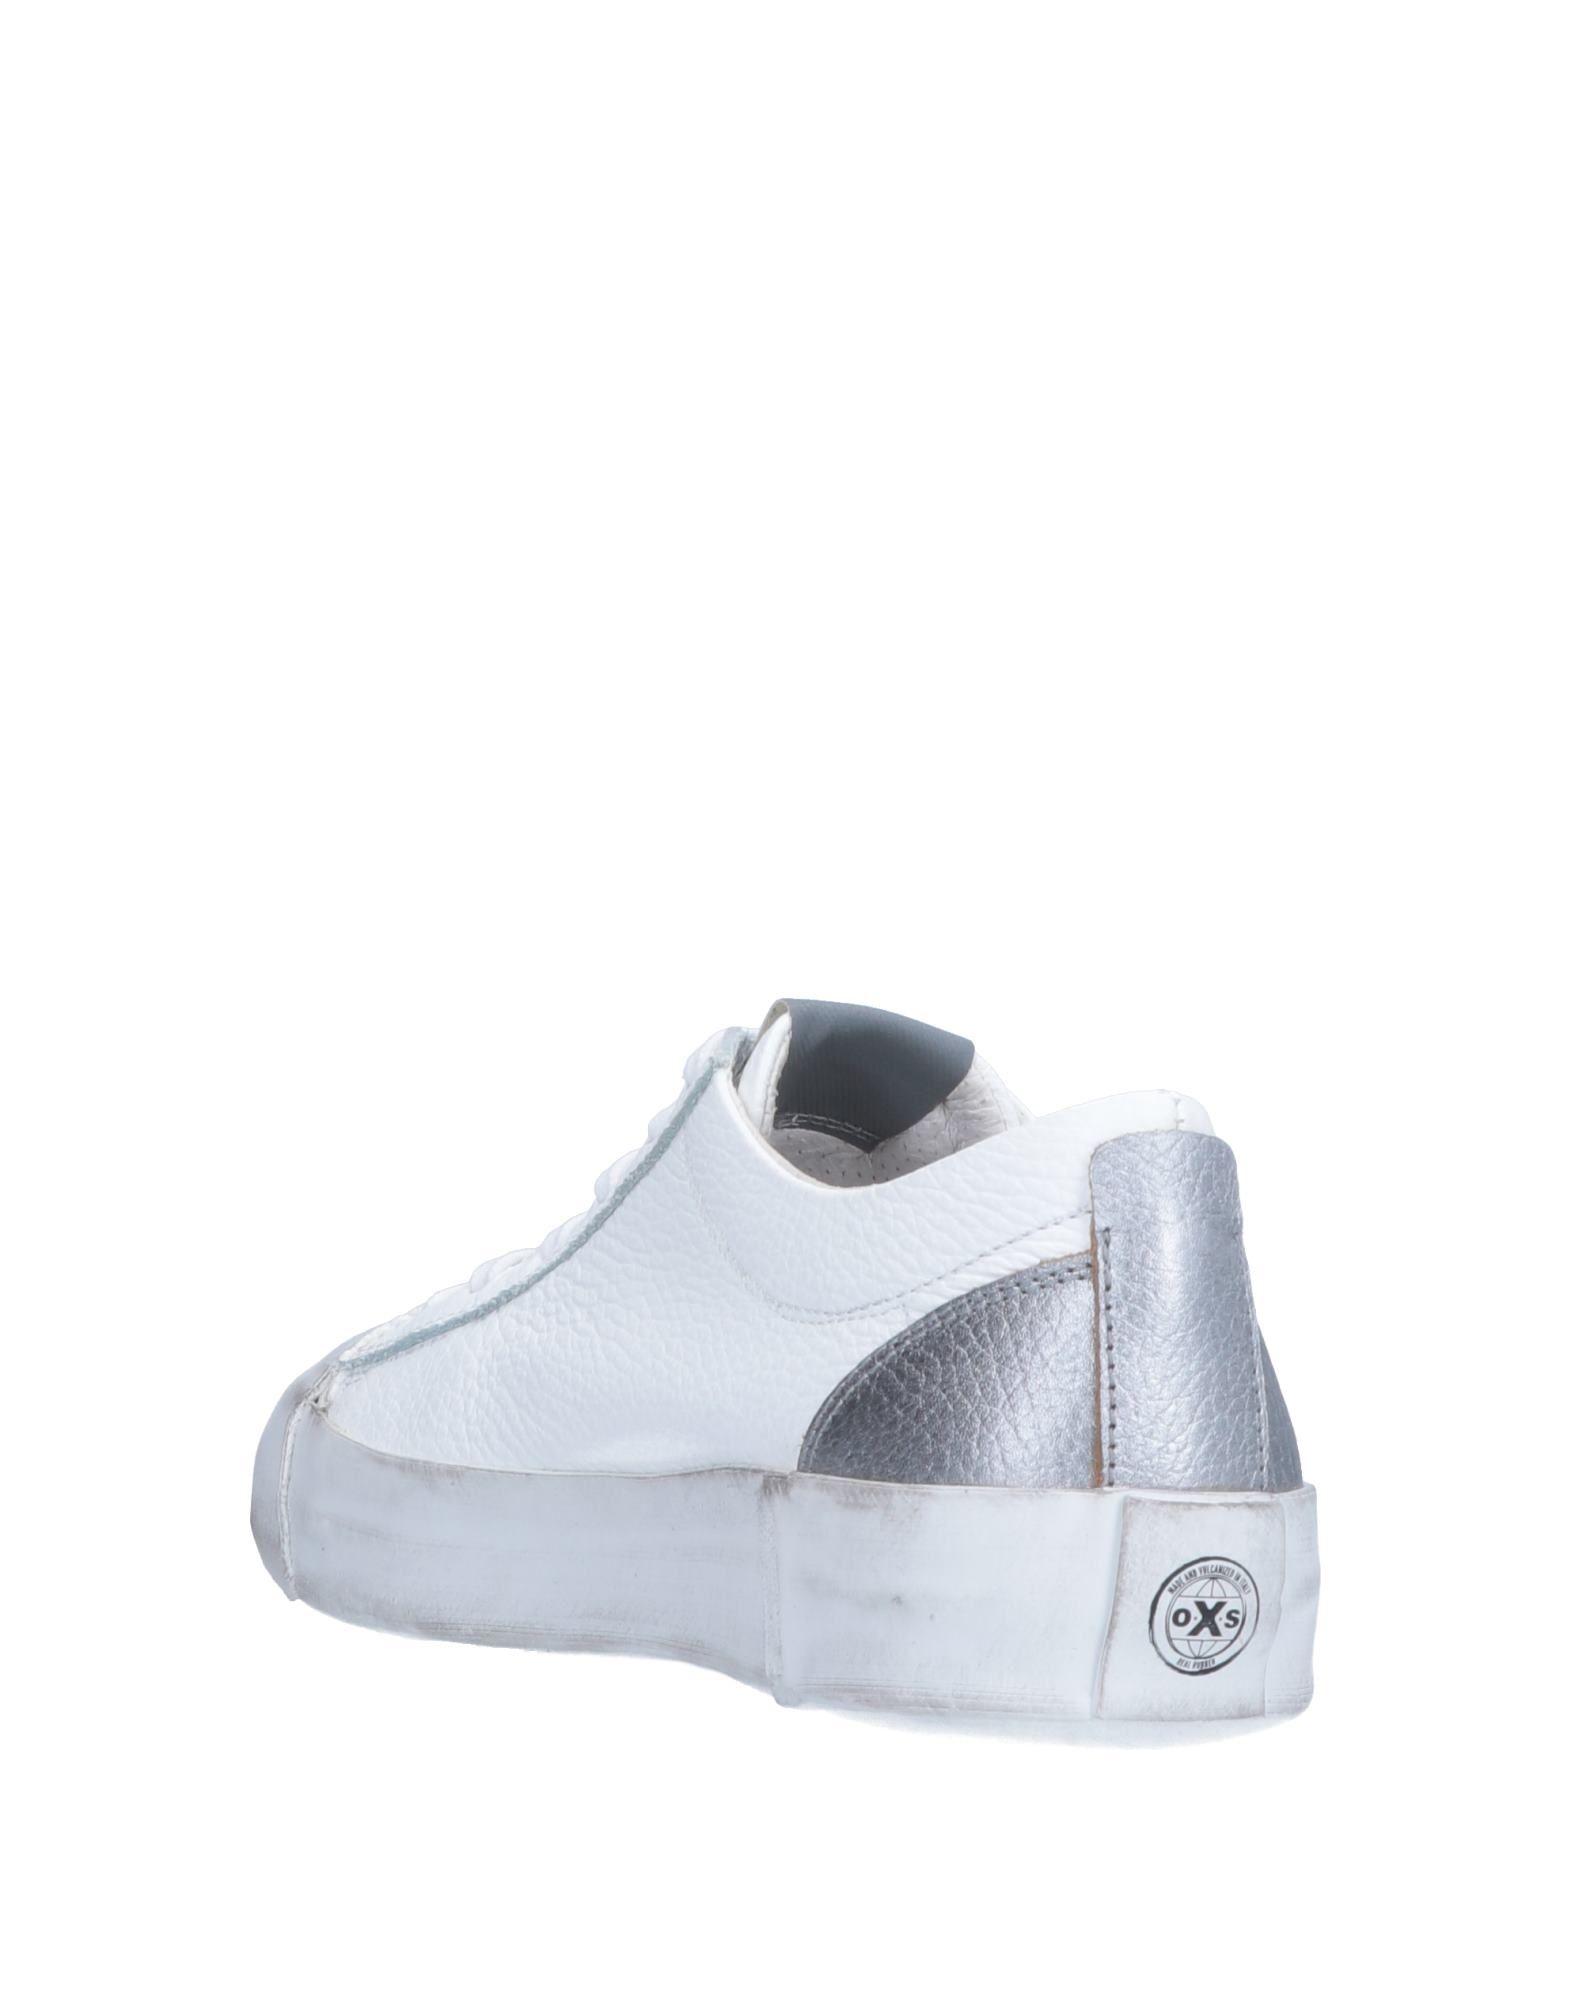 O.X.S. Sneakers - Women O.X.S. O.X.S. O.X.S. Sneakers online on  United Kingdom - 11550224TJ 936e4d